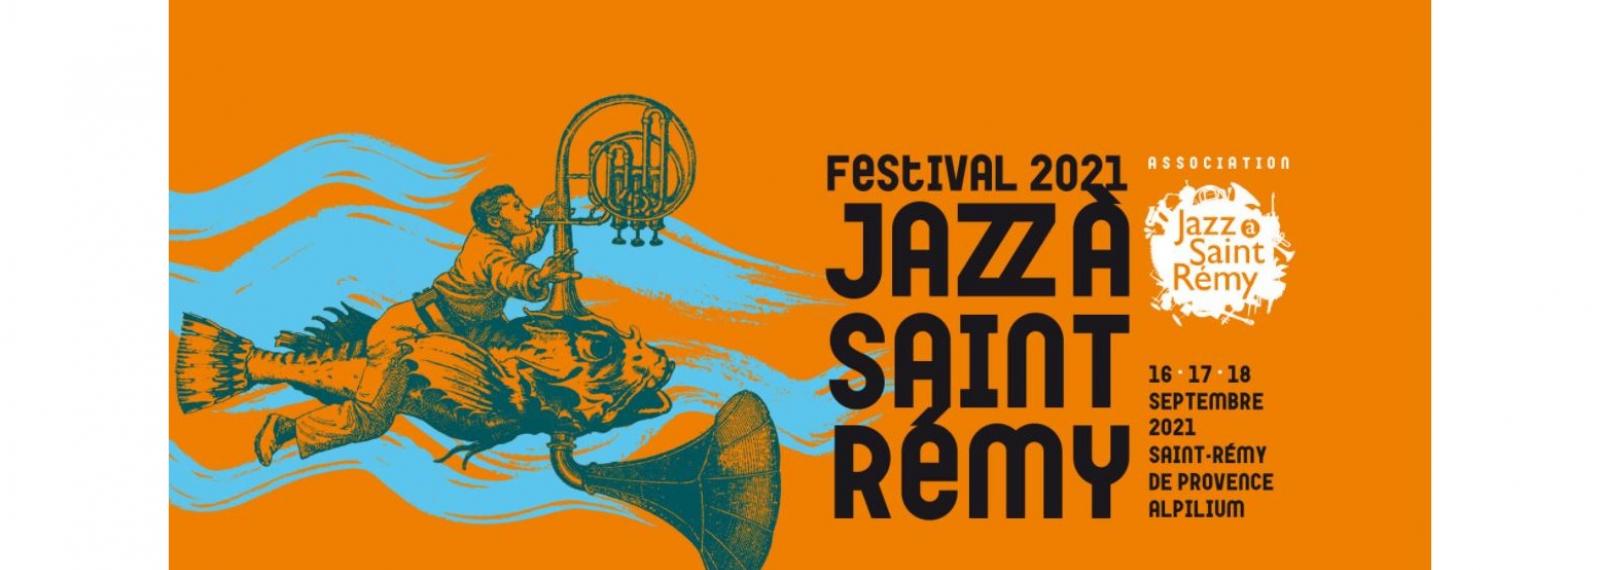 Festival Jazz à Saint-Rémy